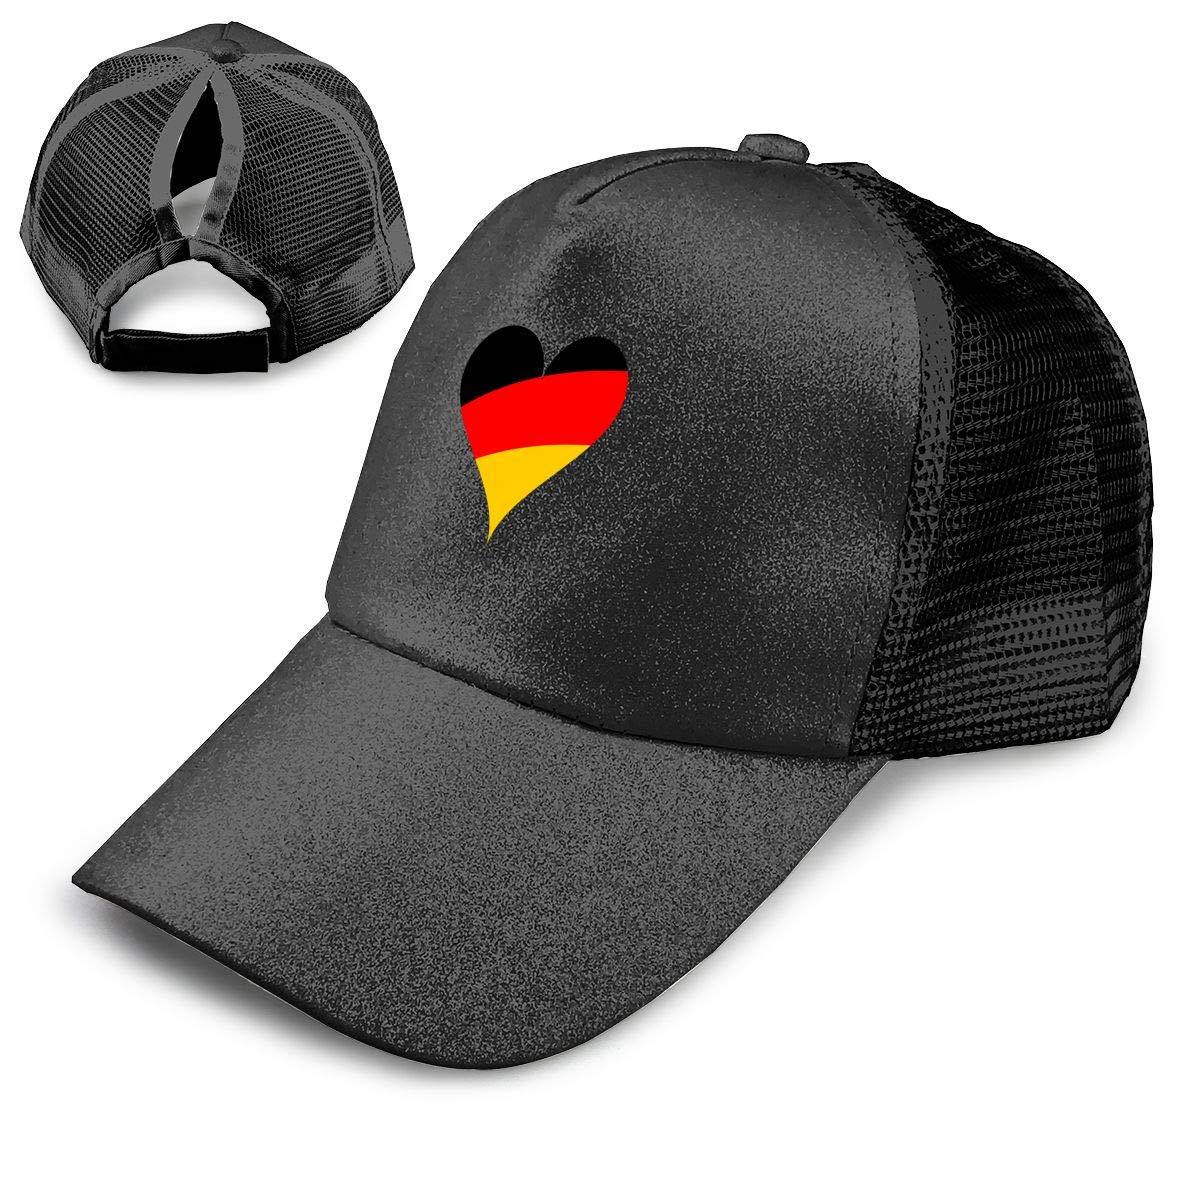 Magically Delicious Irish Funny Adjustable Trucker Hat Cap